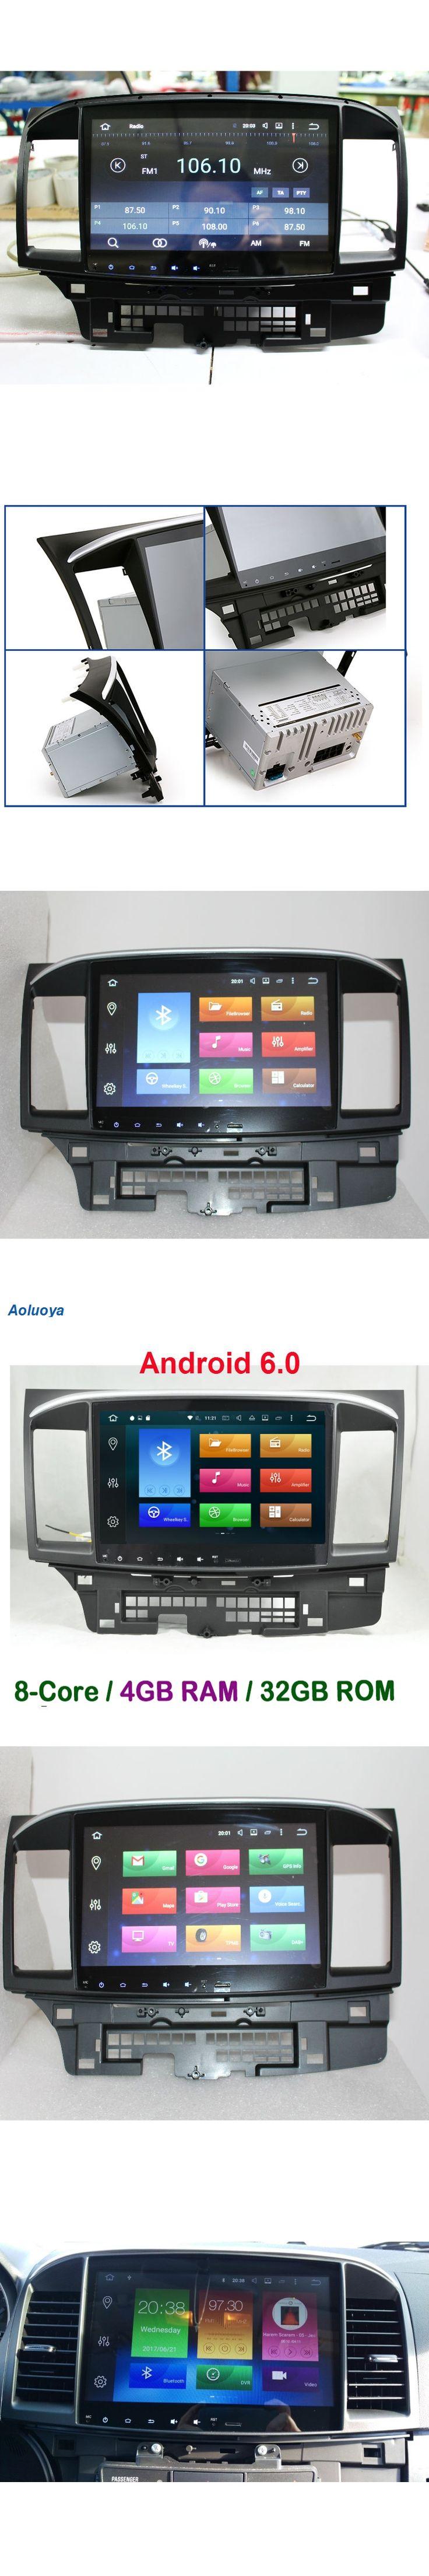 Aoluoya RAM 4GB Octa Core Android CAR DVD GPS Player For Mitsubishi Lancer 2007-2013 2014 2015 Audio Radio Navigation WIFI DAB+